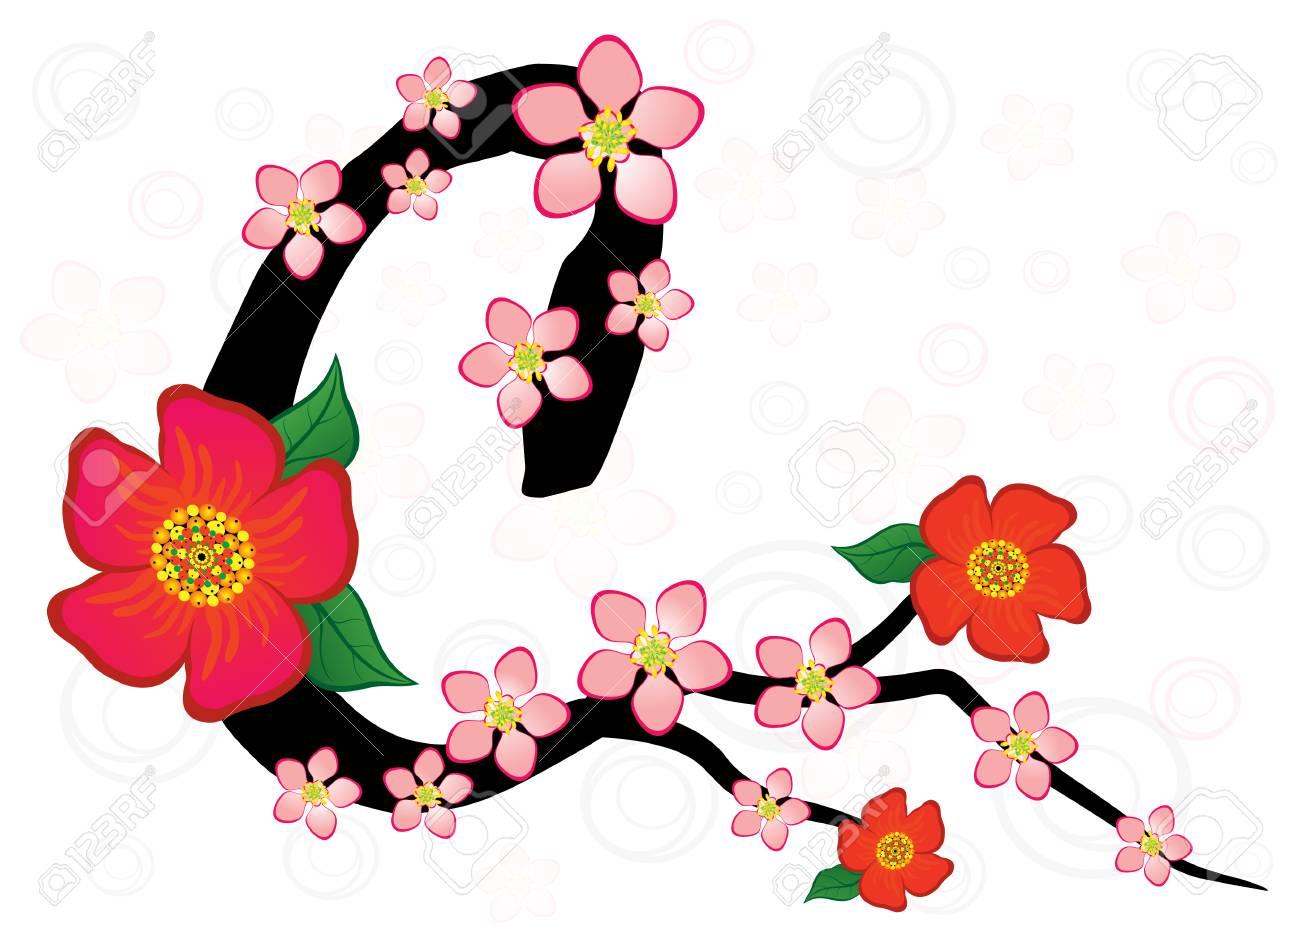 1300x939 Alphabet With Gentle Sakura Flowers. Letter C Royalty Free